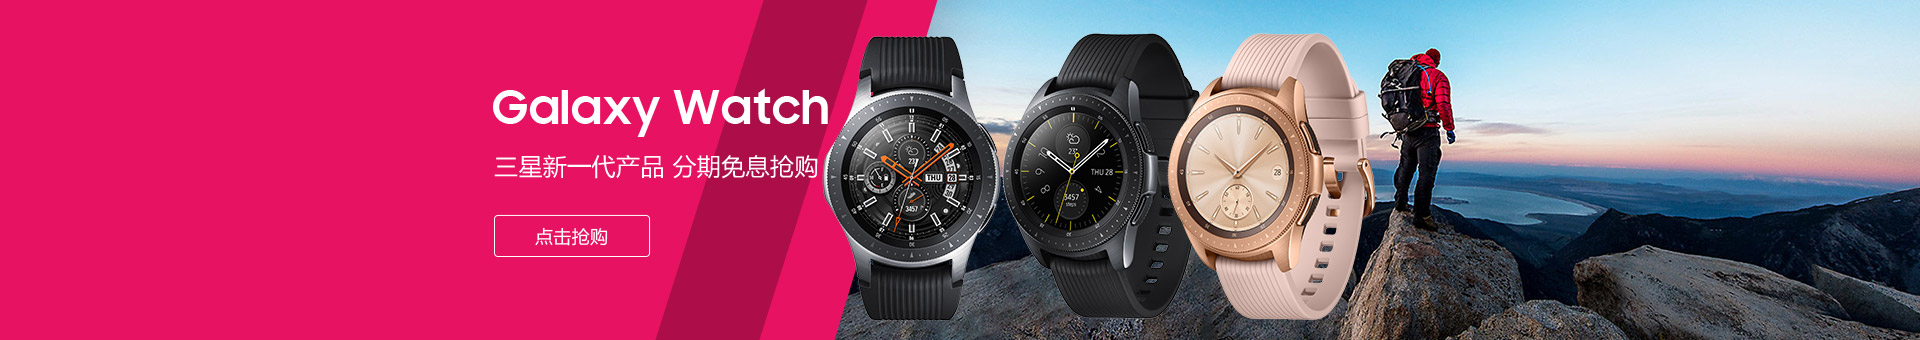 Galaxy Watch(蓝牙版) 开售